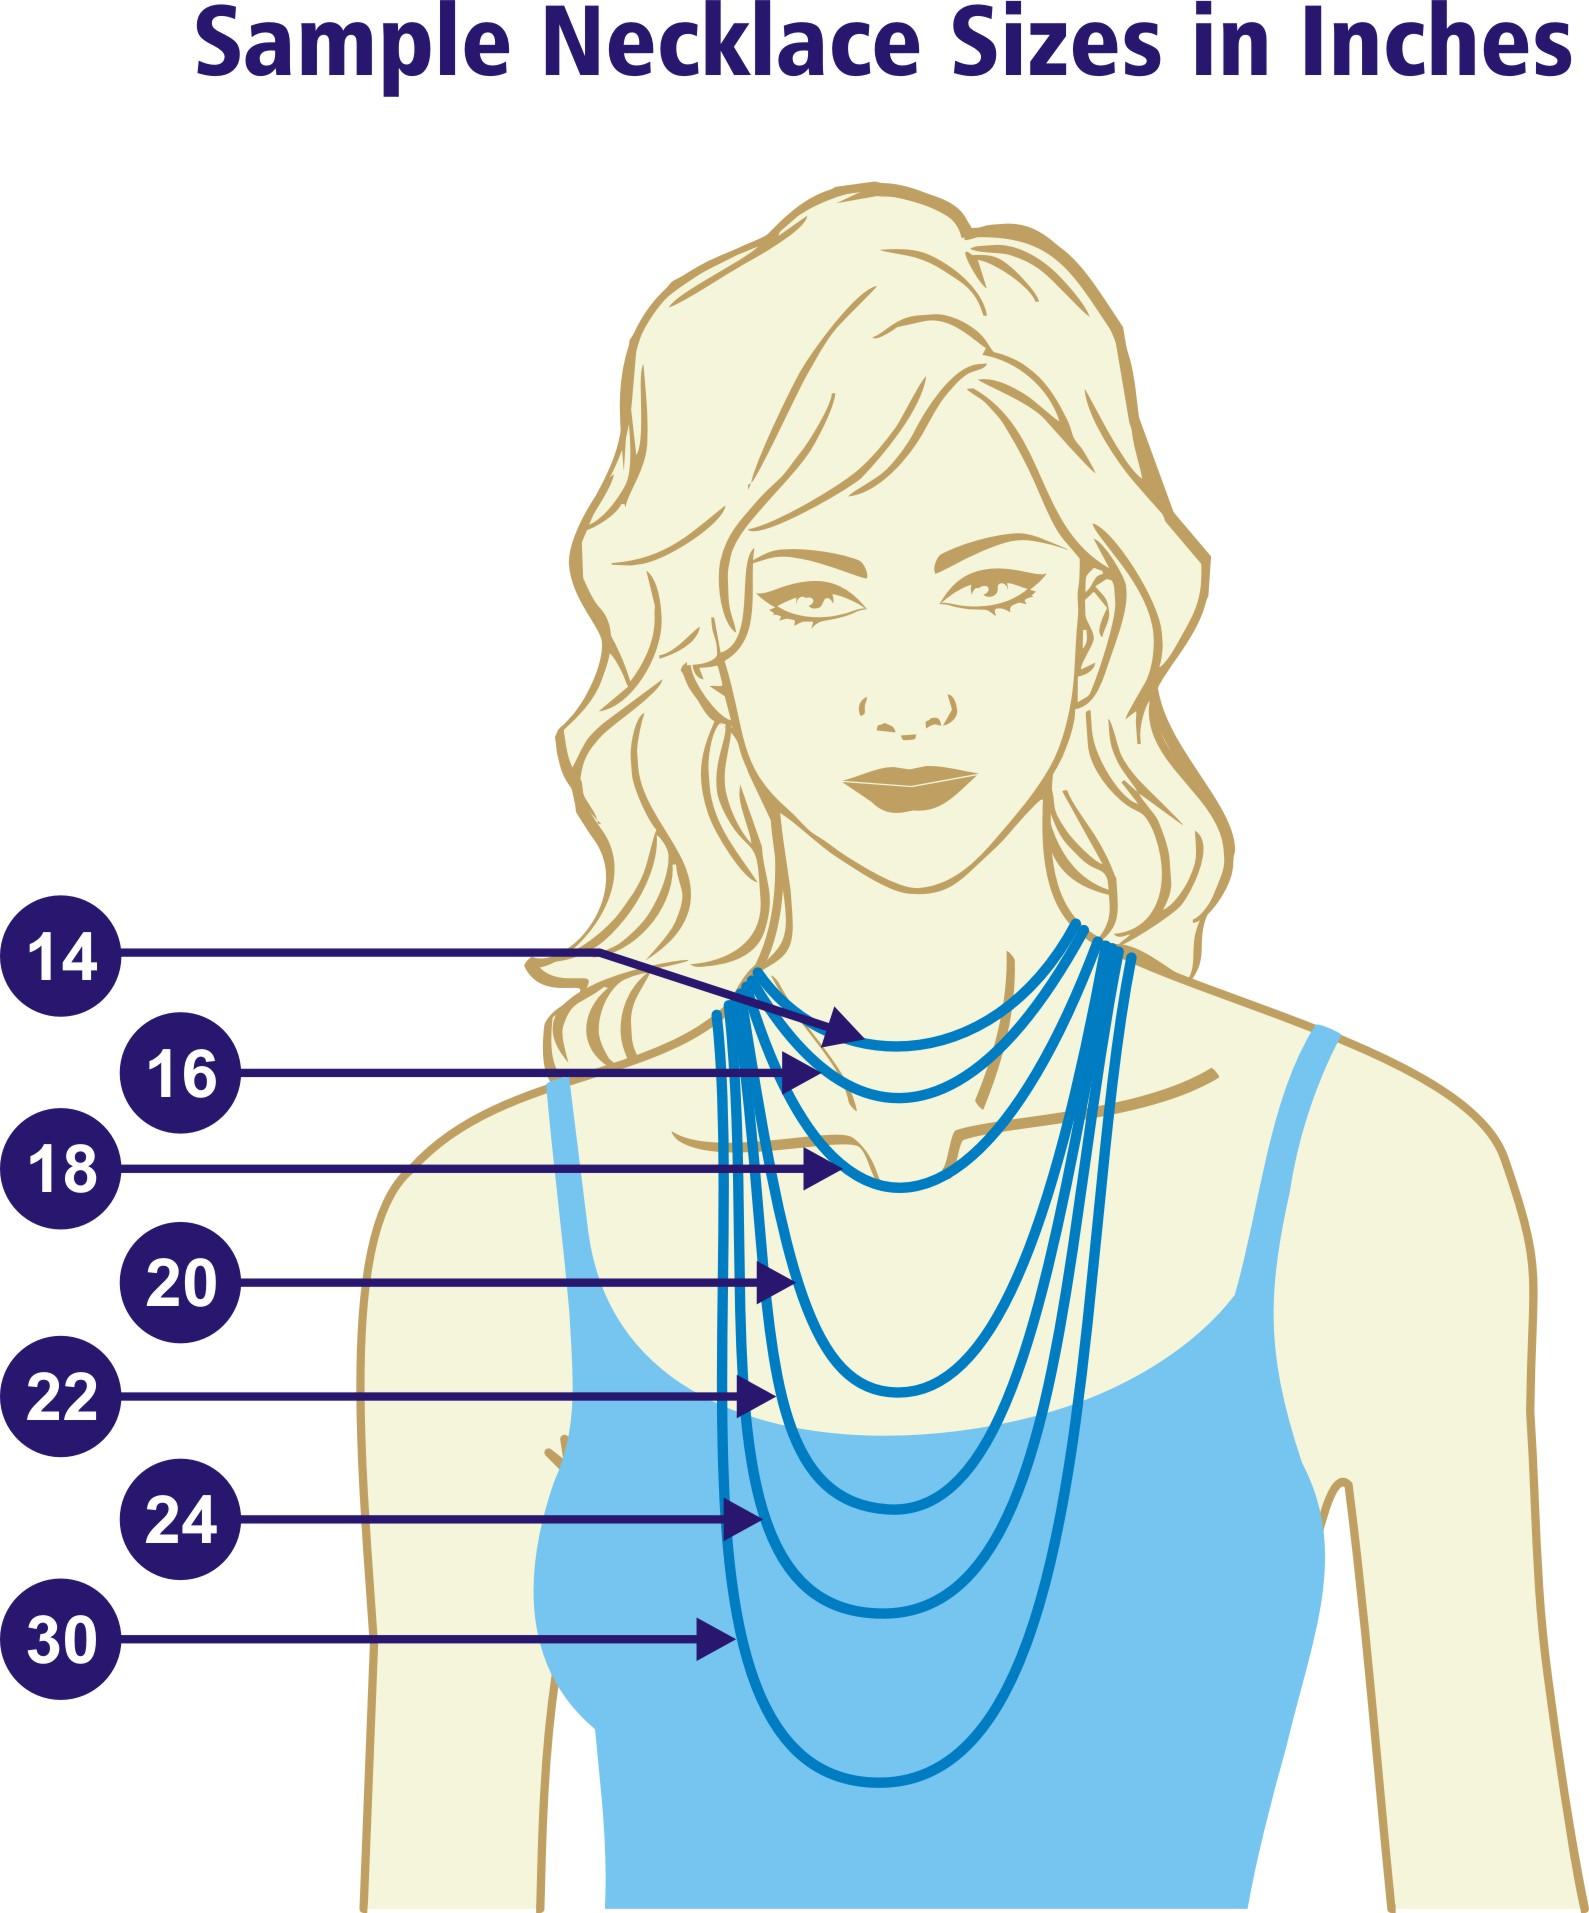 Sample_Necklace_Sizes.jpg